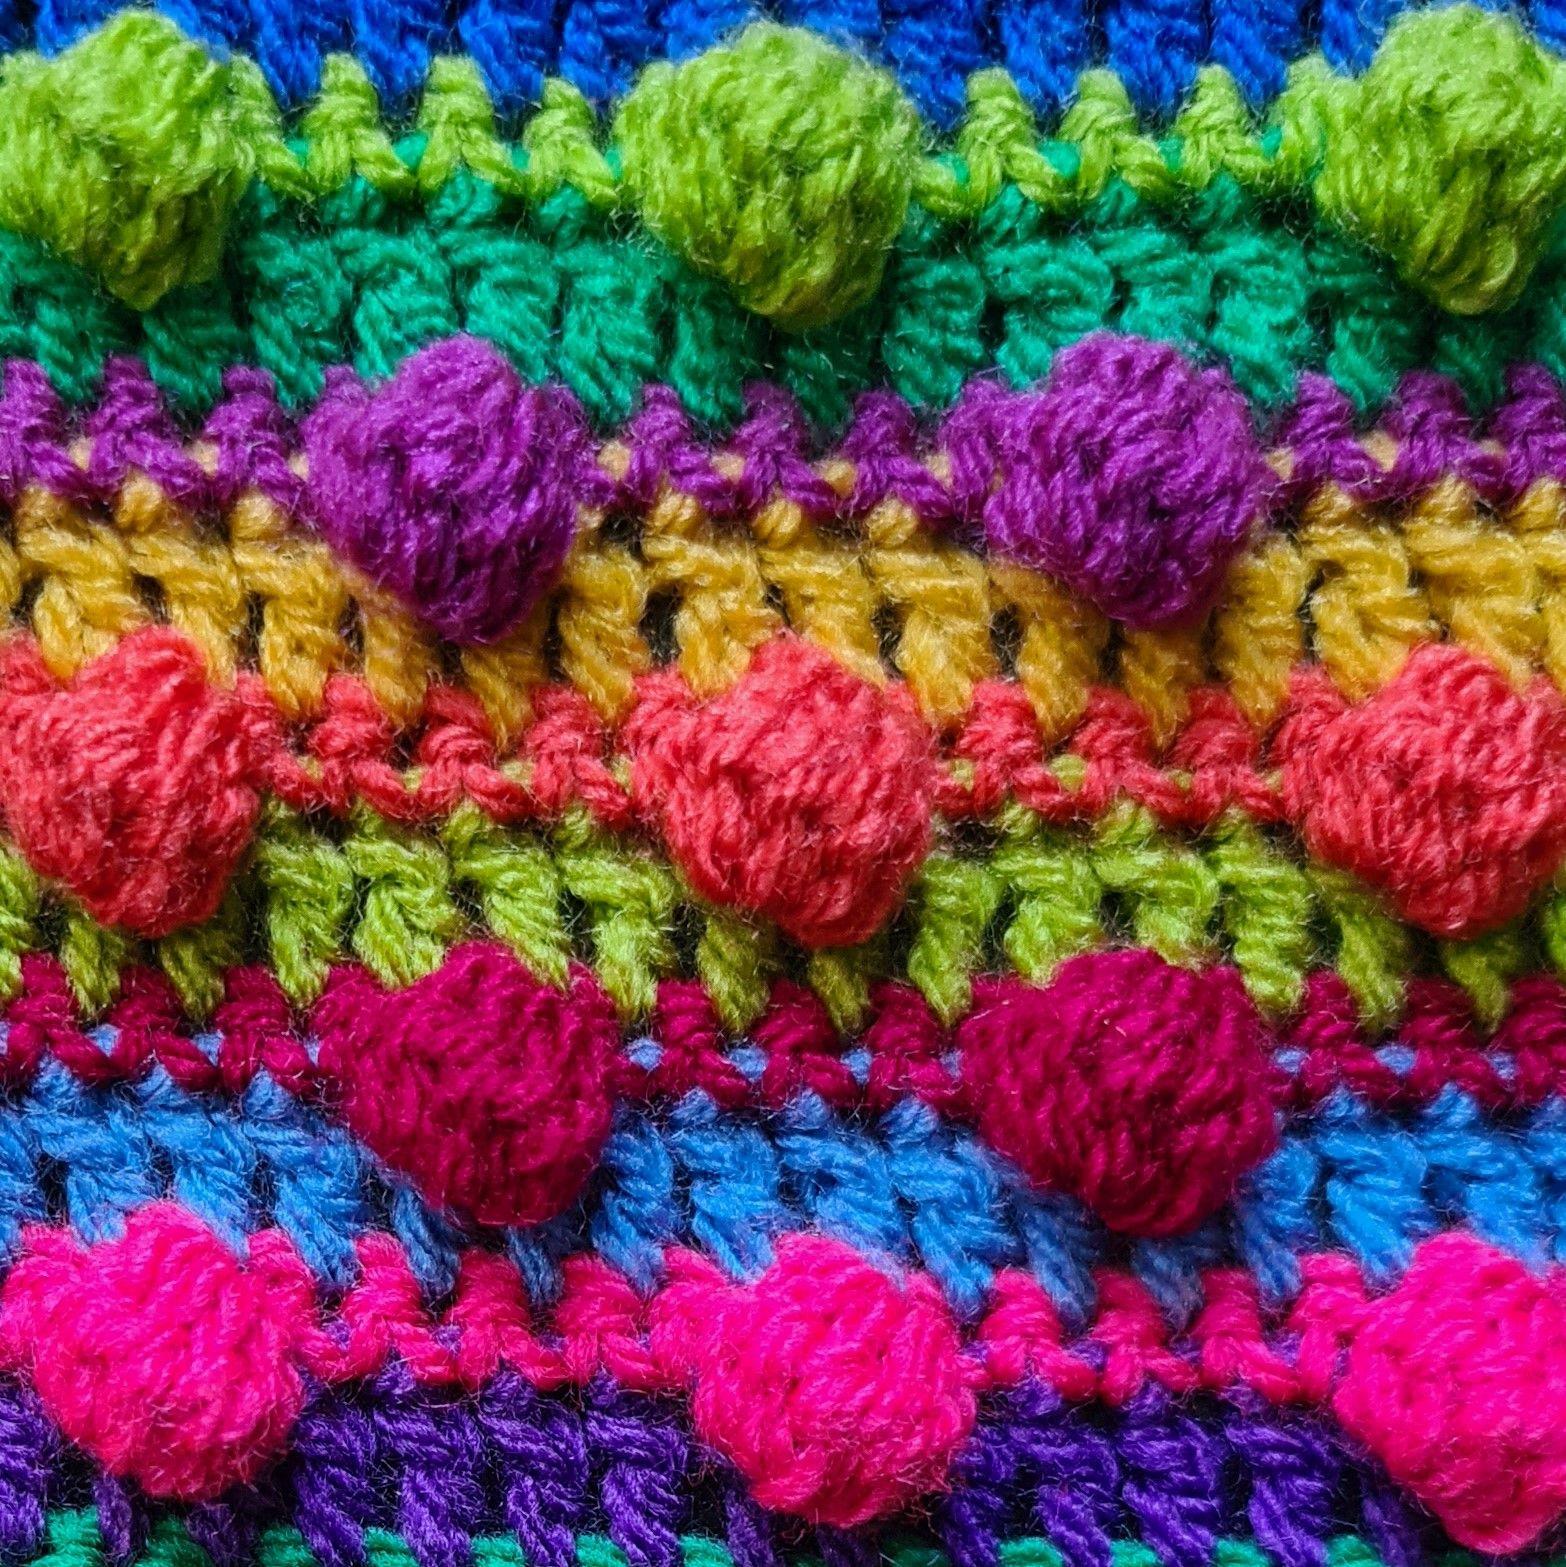 Diana Bensted - Crochet masterclass 4 Bobbles